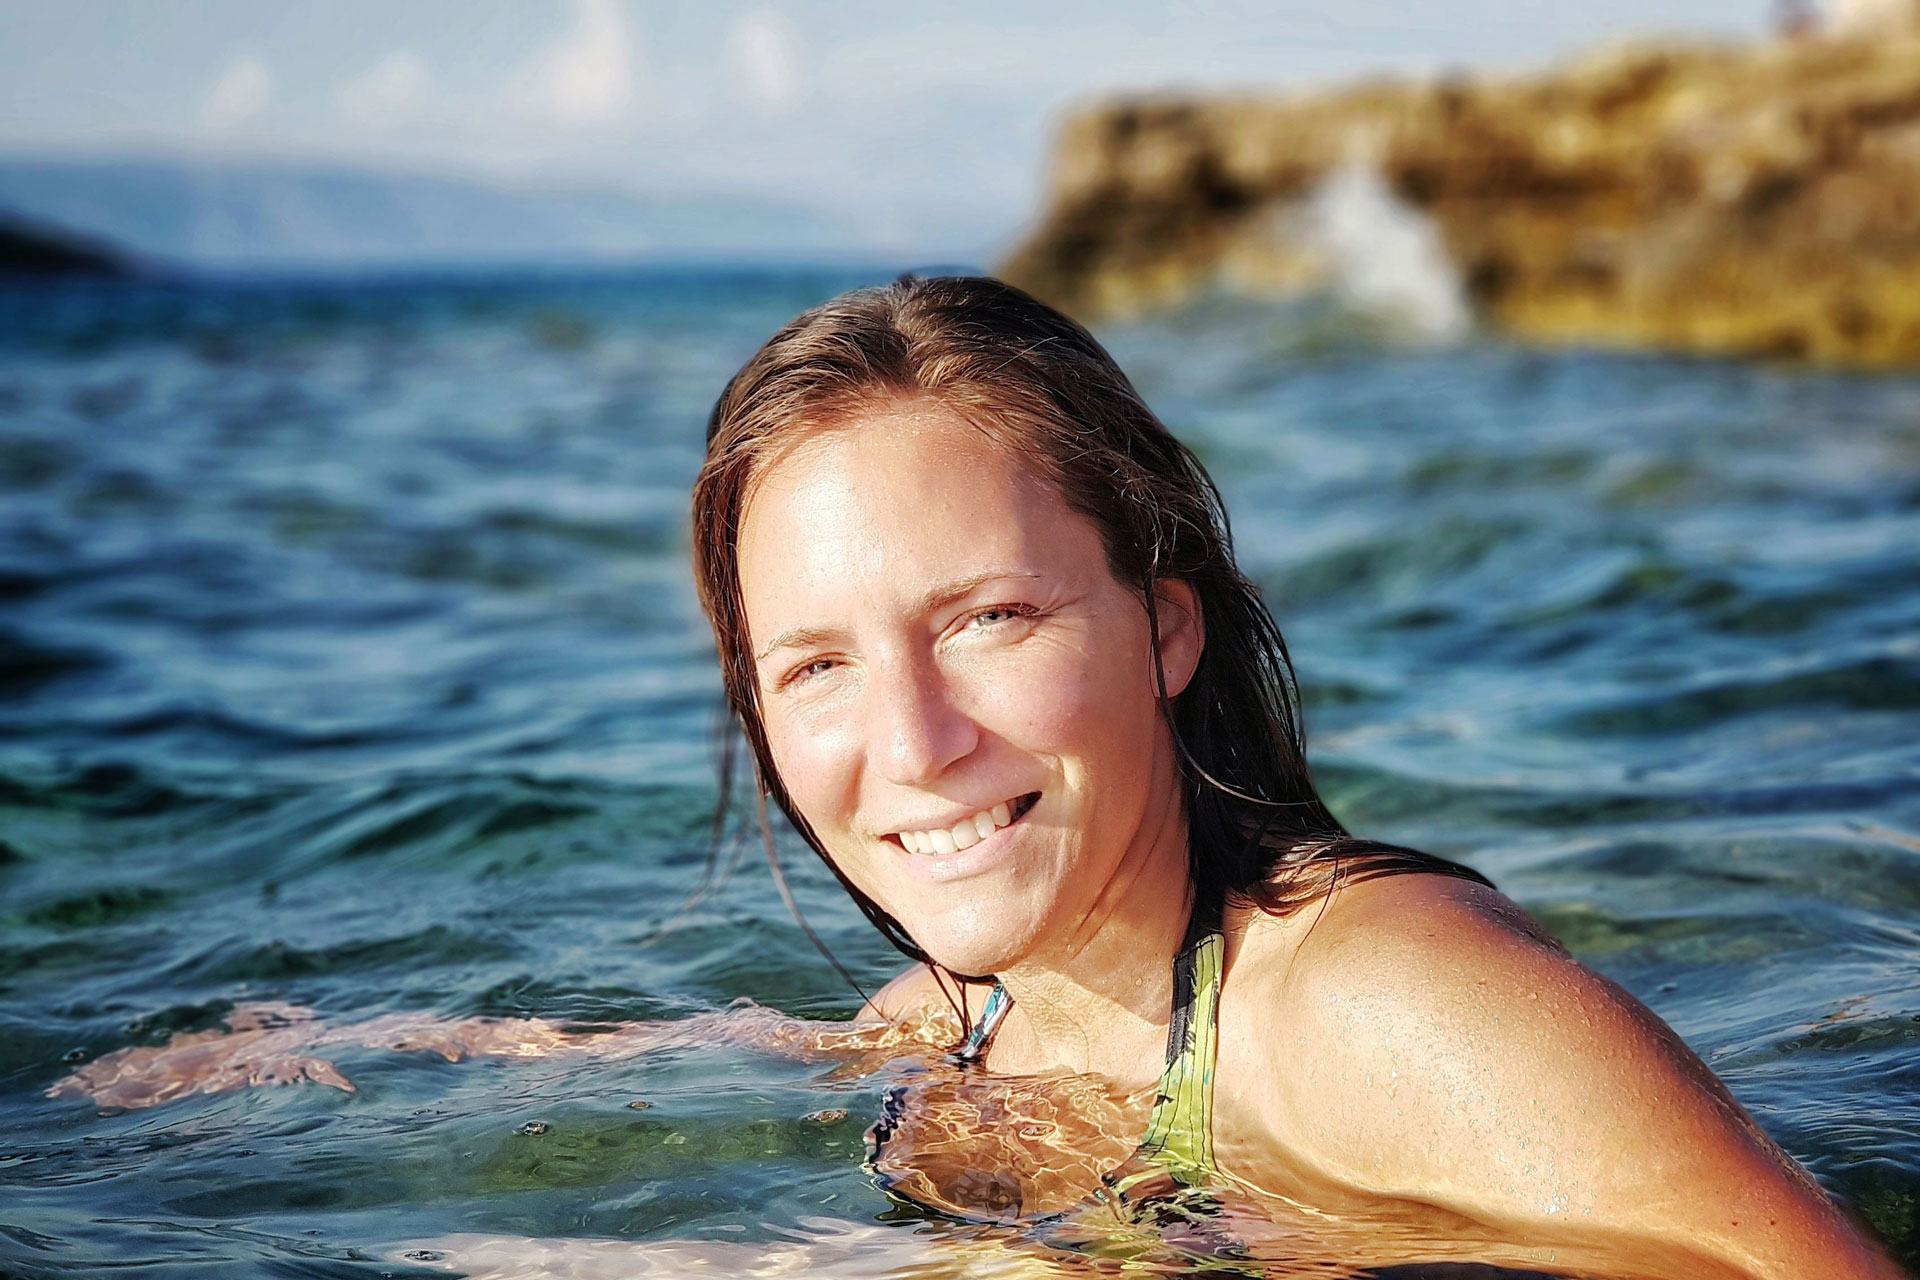 Fitness Expertin Bernadette Hörner beim schwimmen im Meer